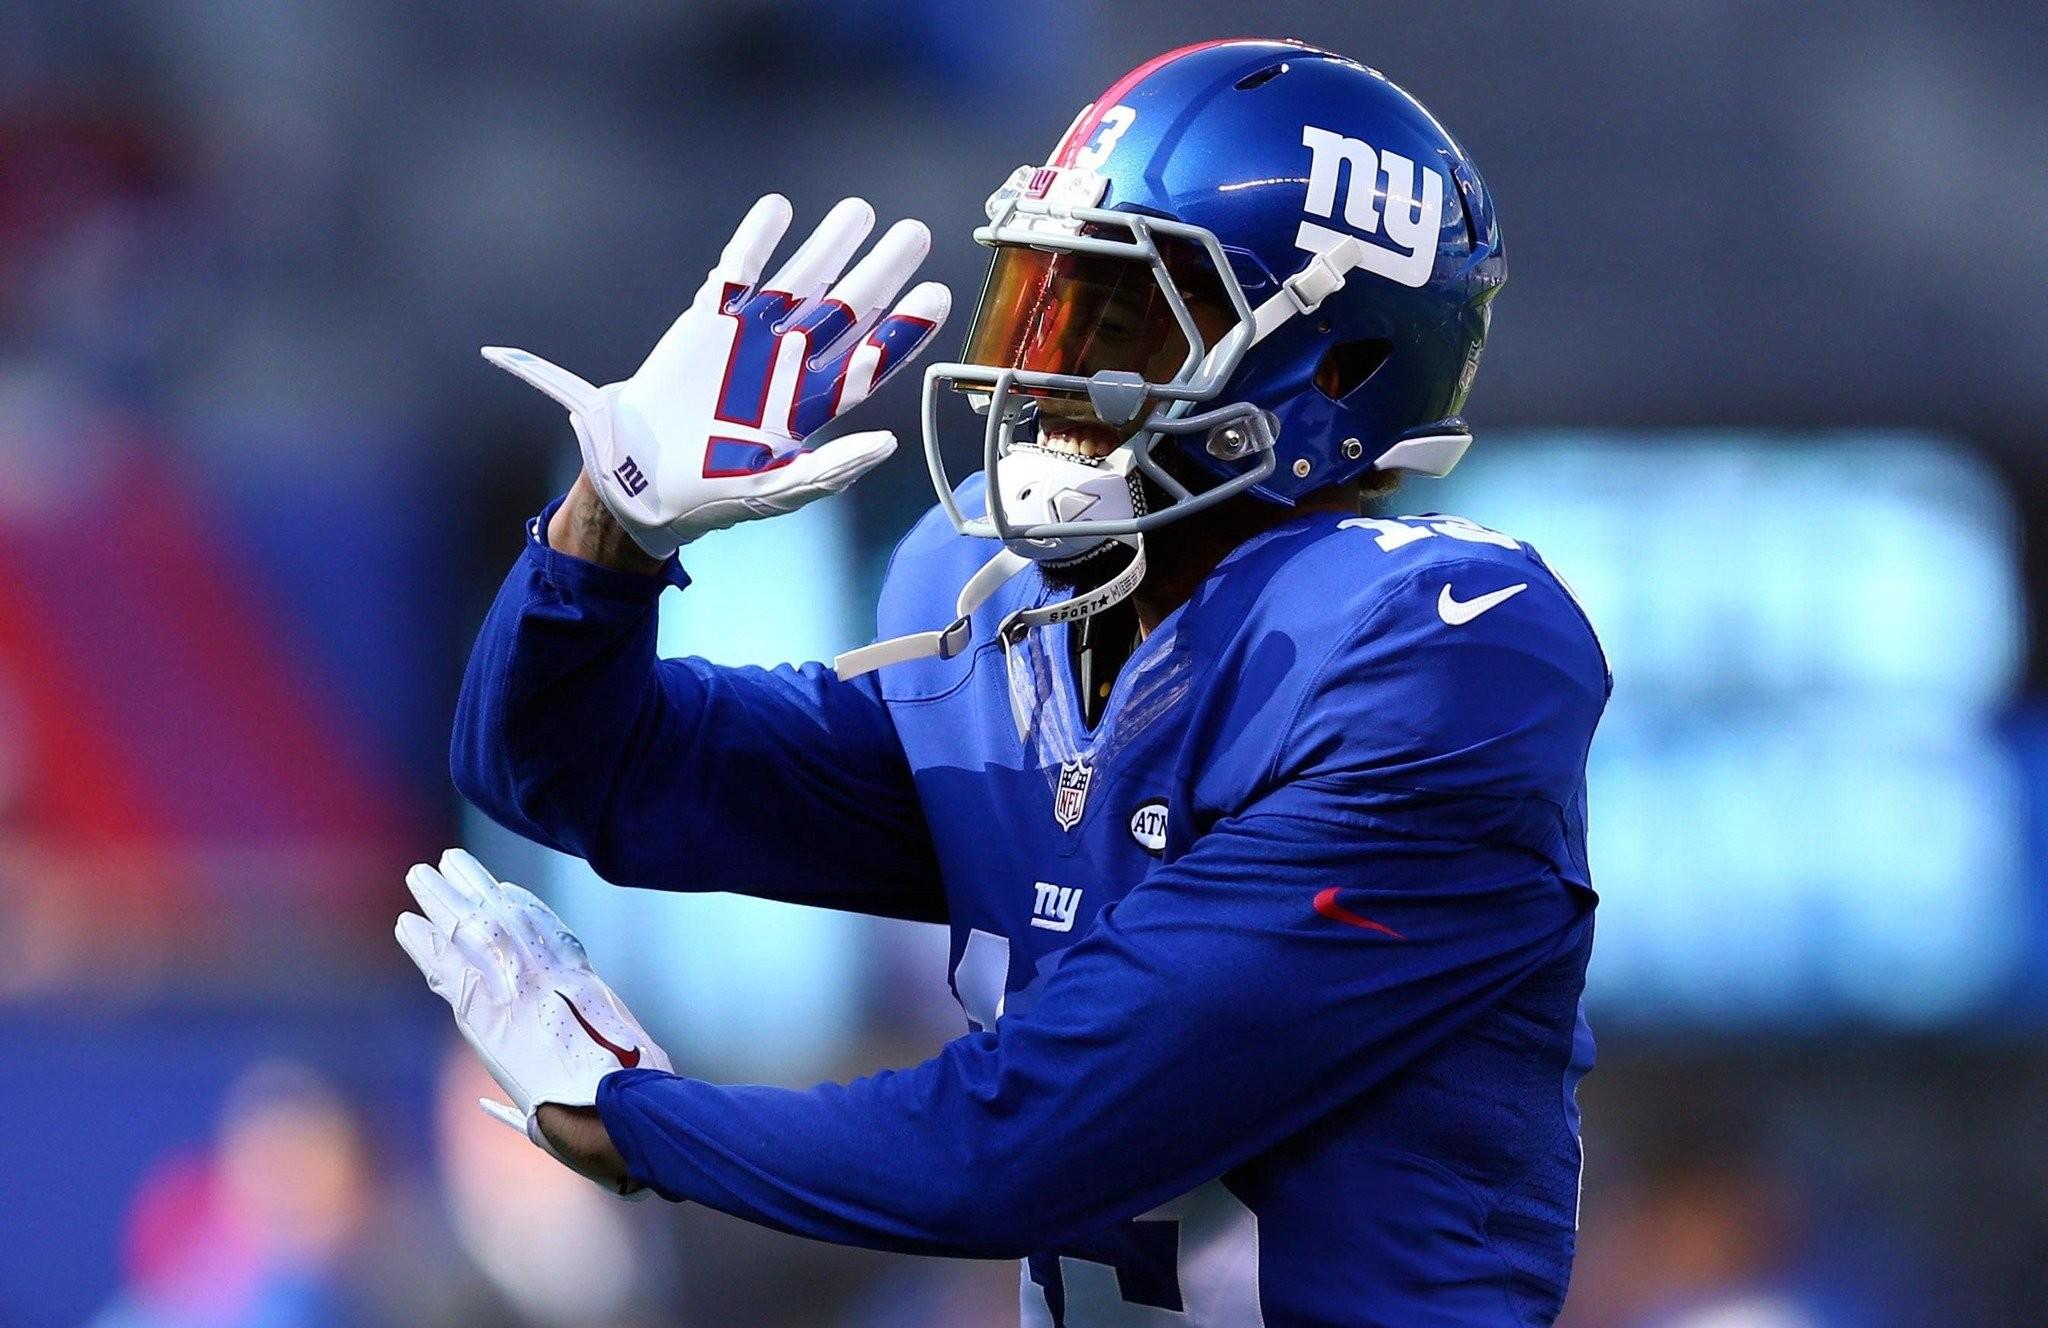 WATCH: Giants' Odell Beckham Jr. makes another sick 1-handed catch vs. Jets  | NJ.com